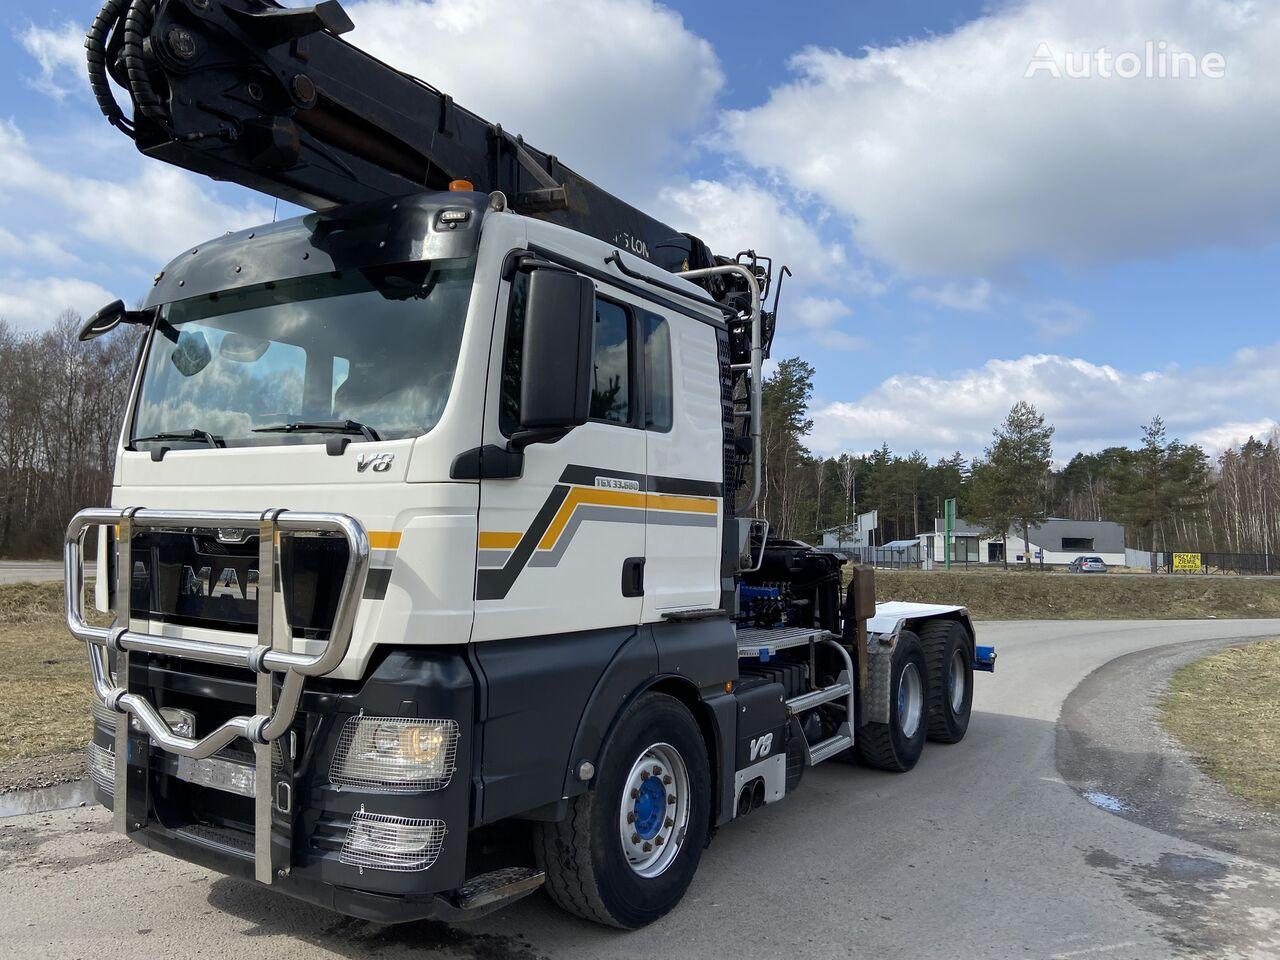 MAN TGX 33.680  EPSILON S300 timber truck